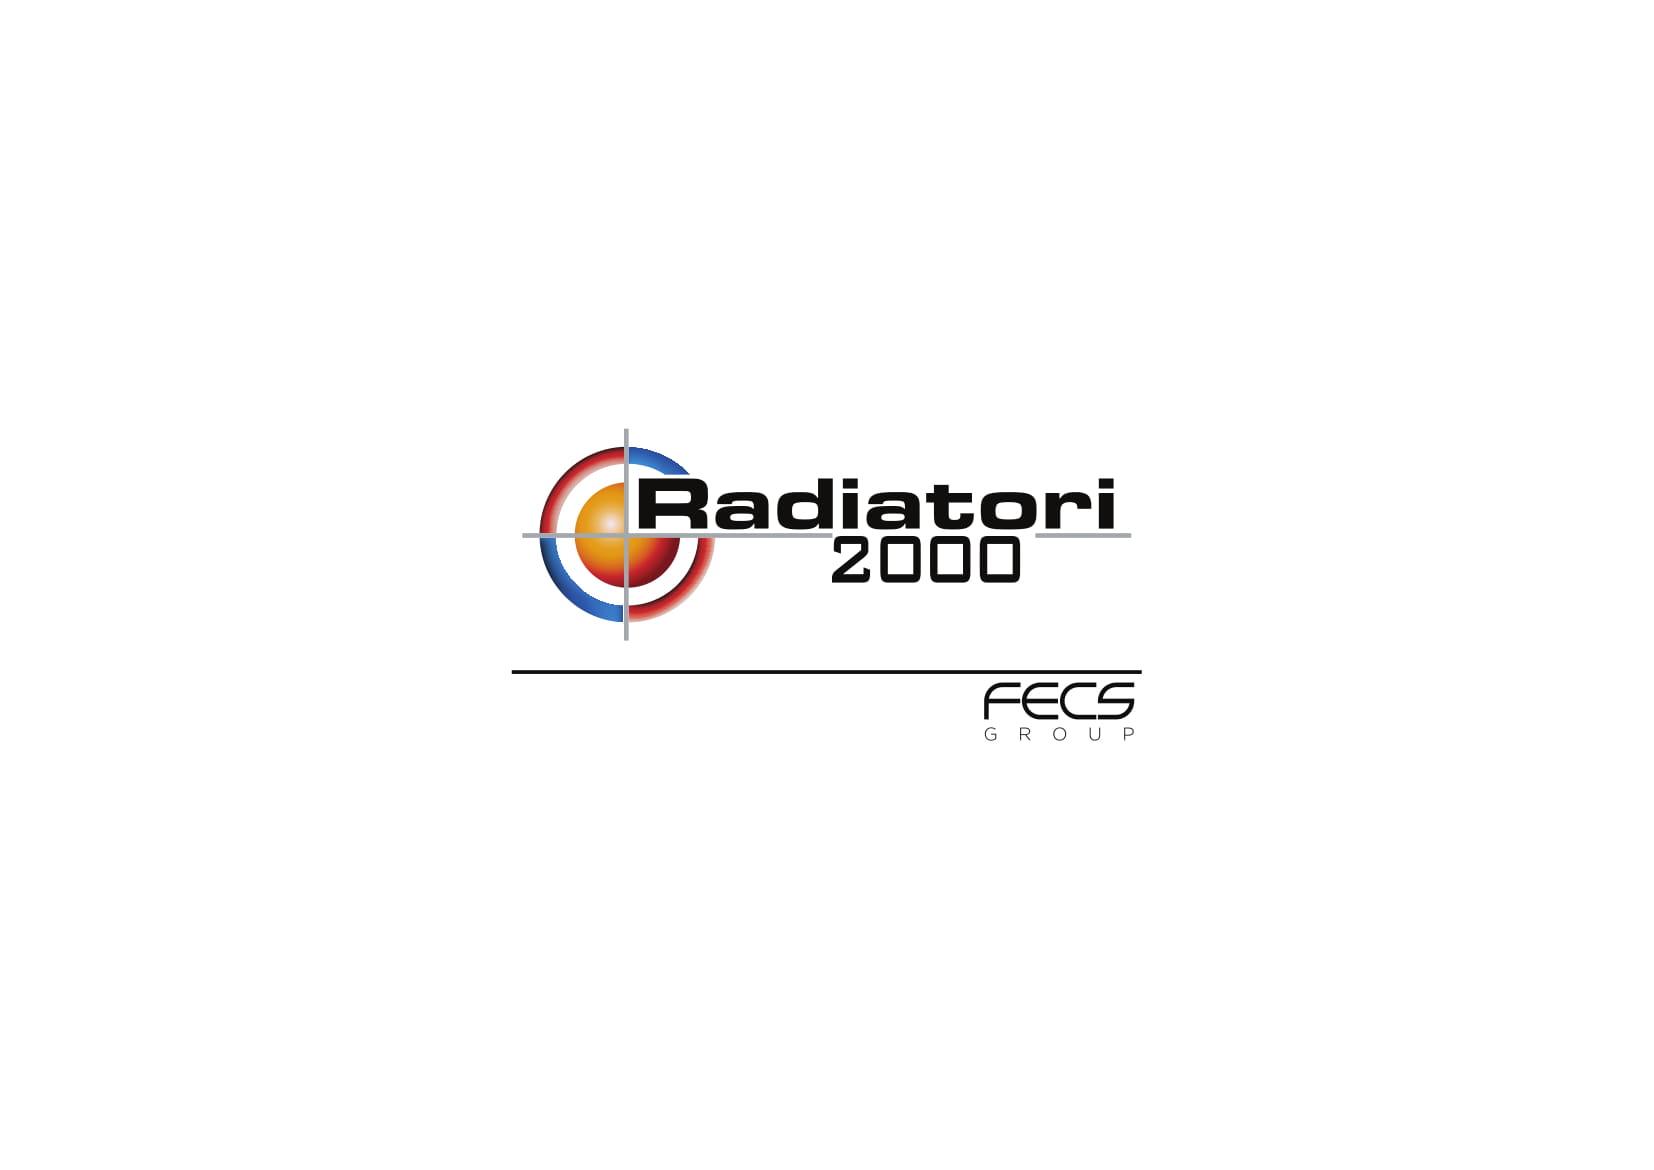 RADIATORI 2000